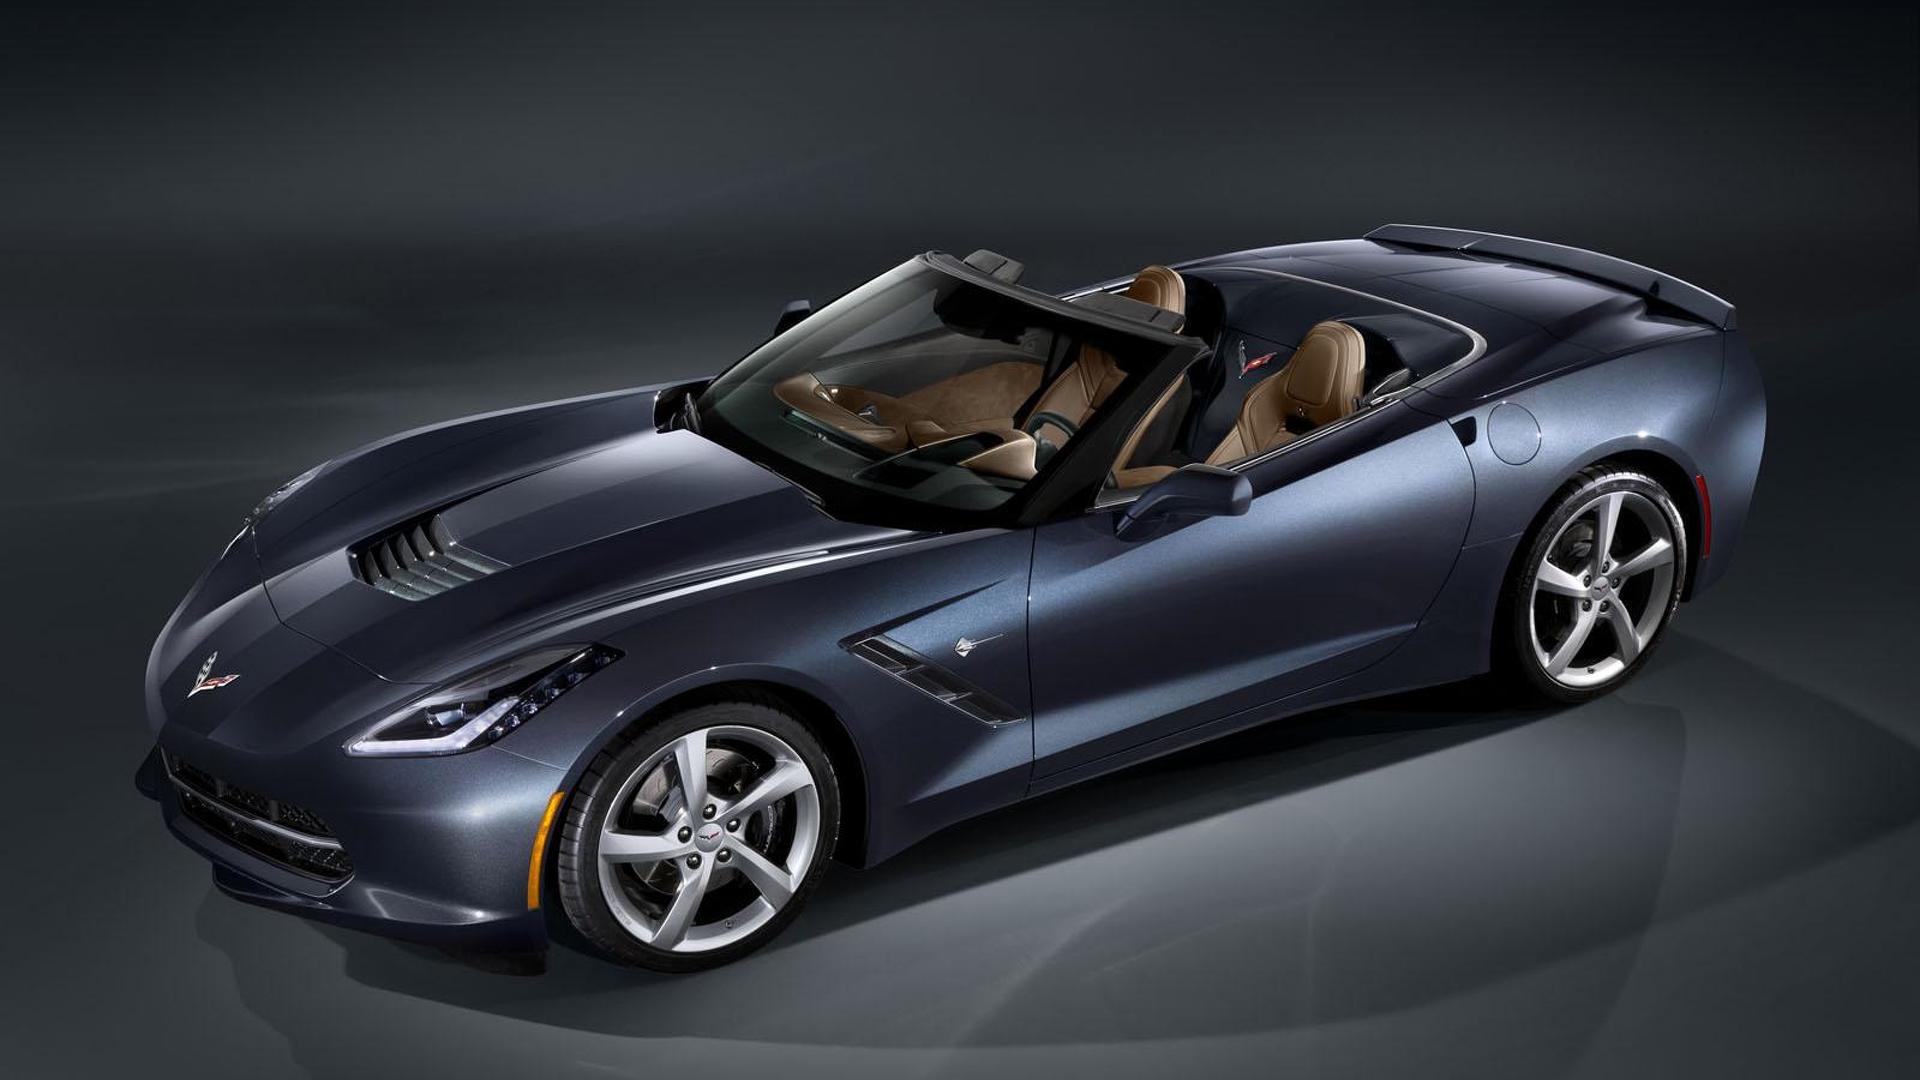 GM to limit Corvette Stingray production despite high demand